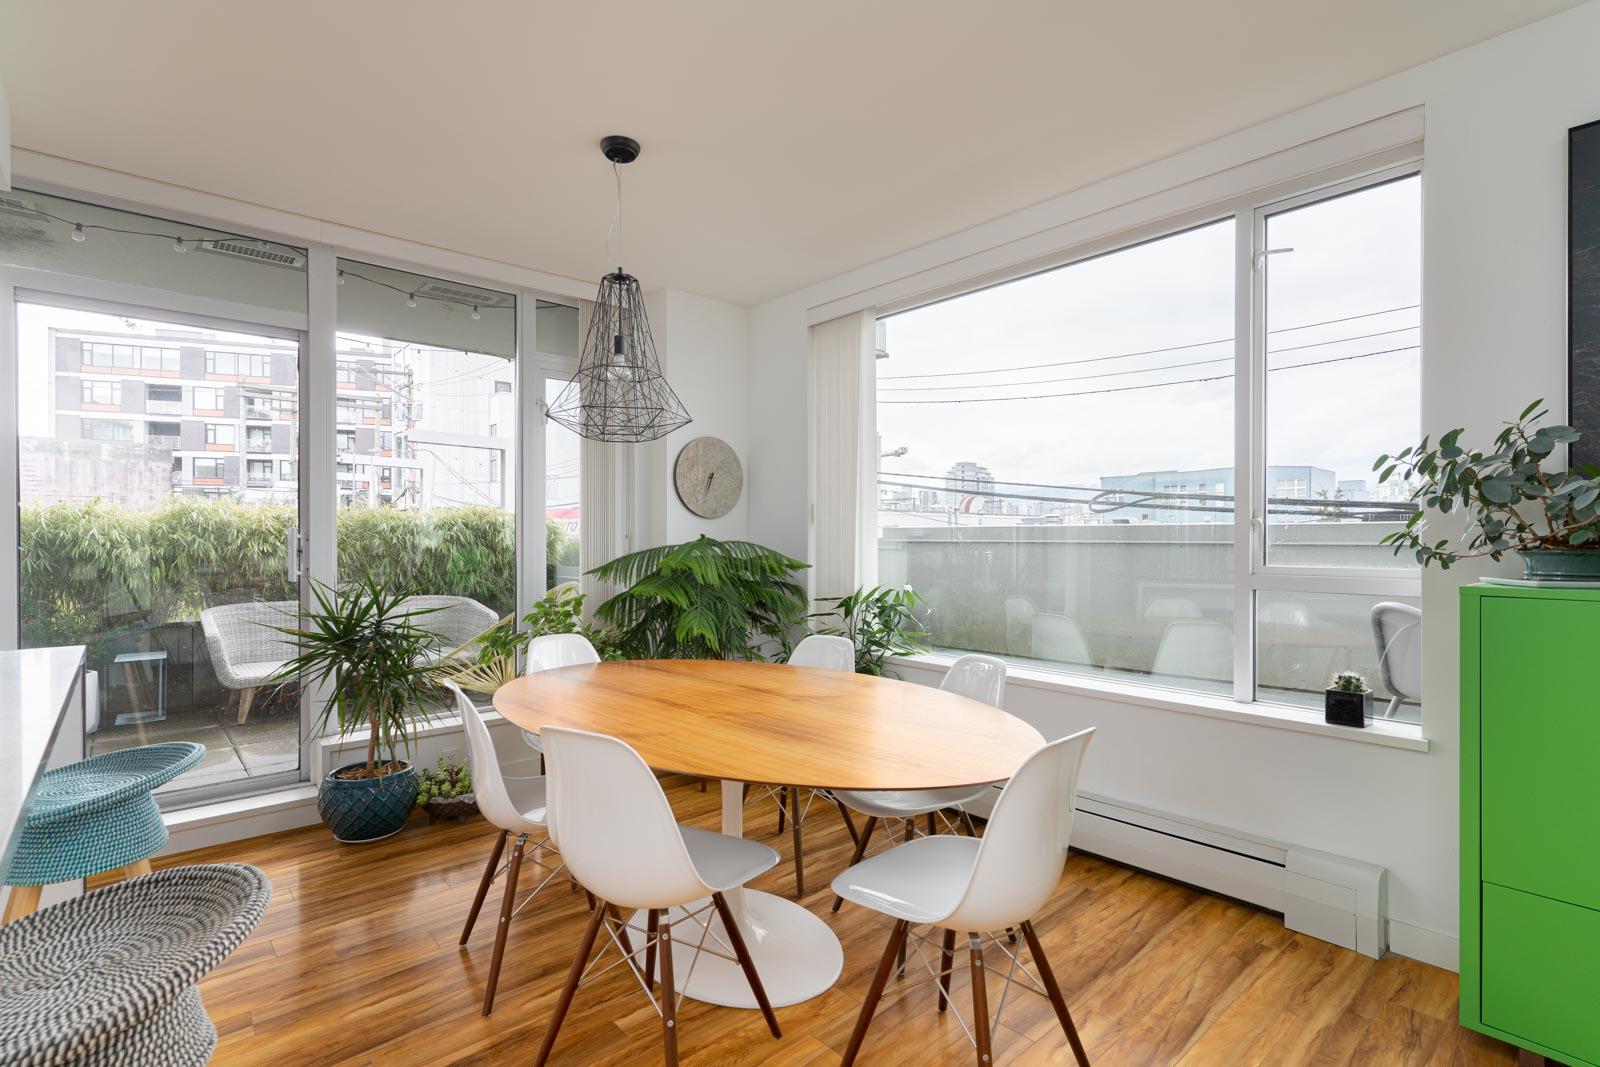 living room with hardwood floors in rental house in the Mount pleasant neighbourhood of vancouver